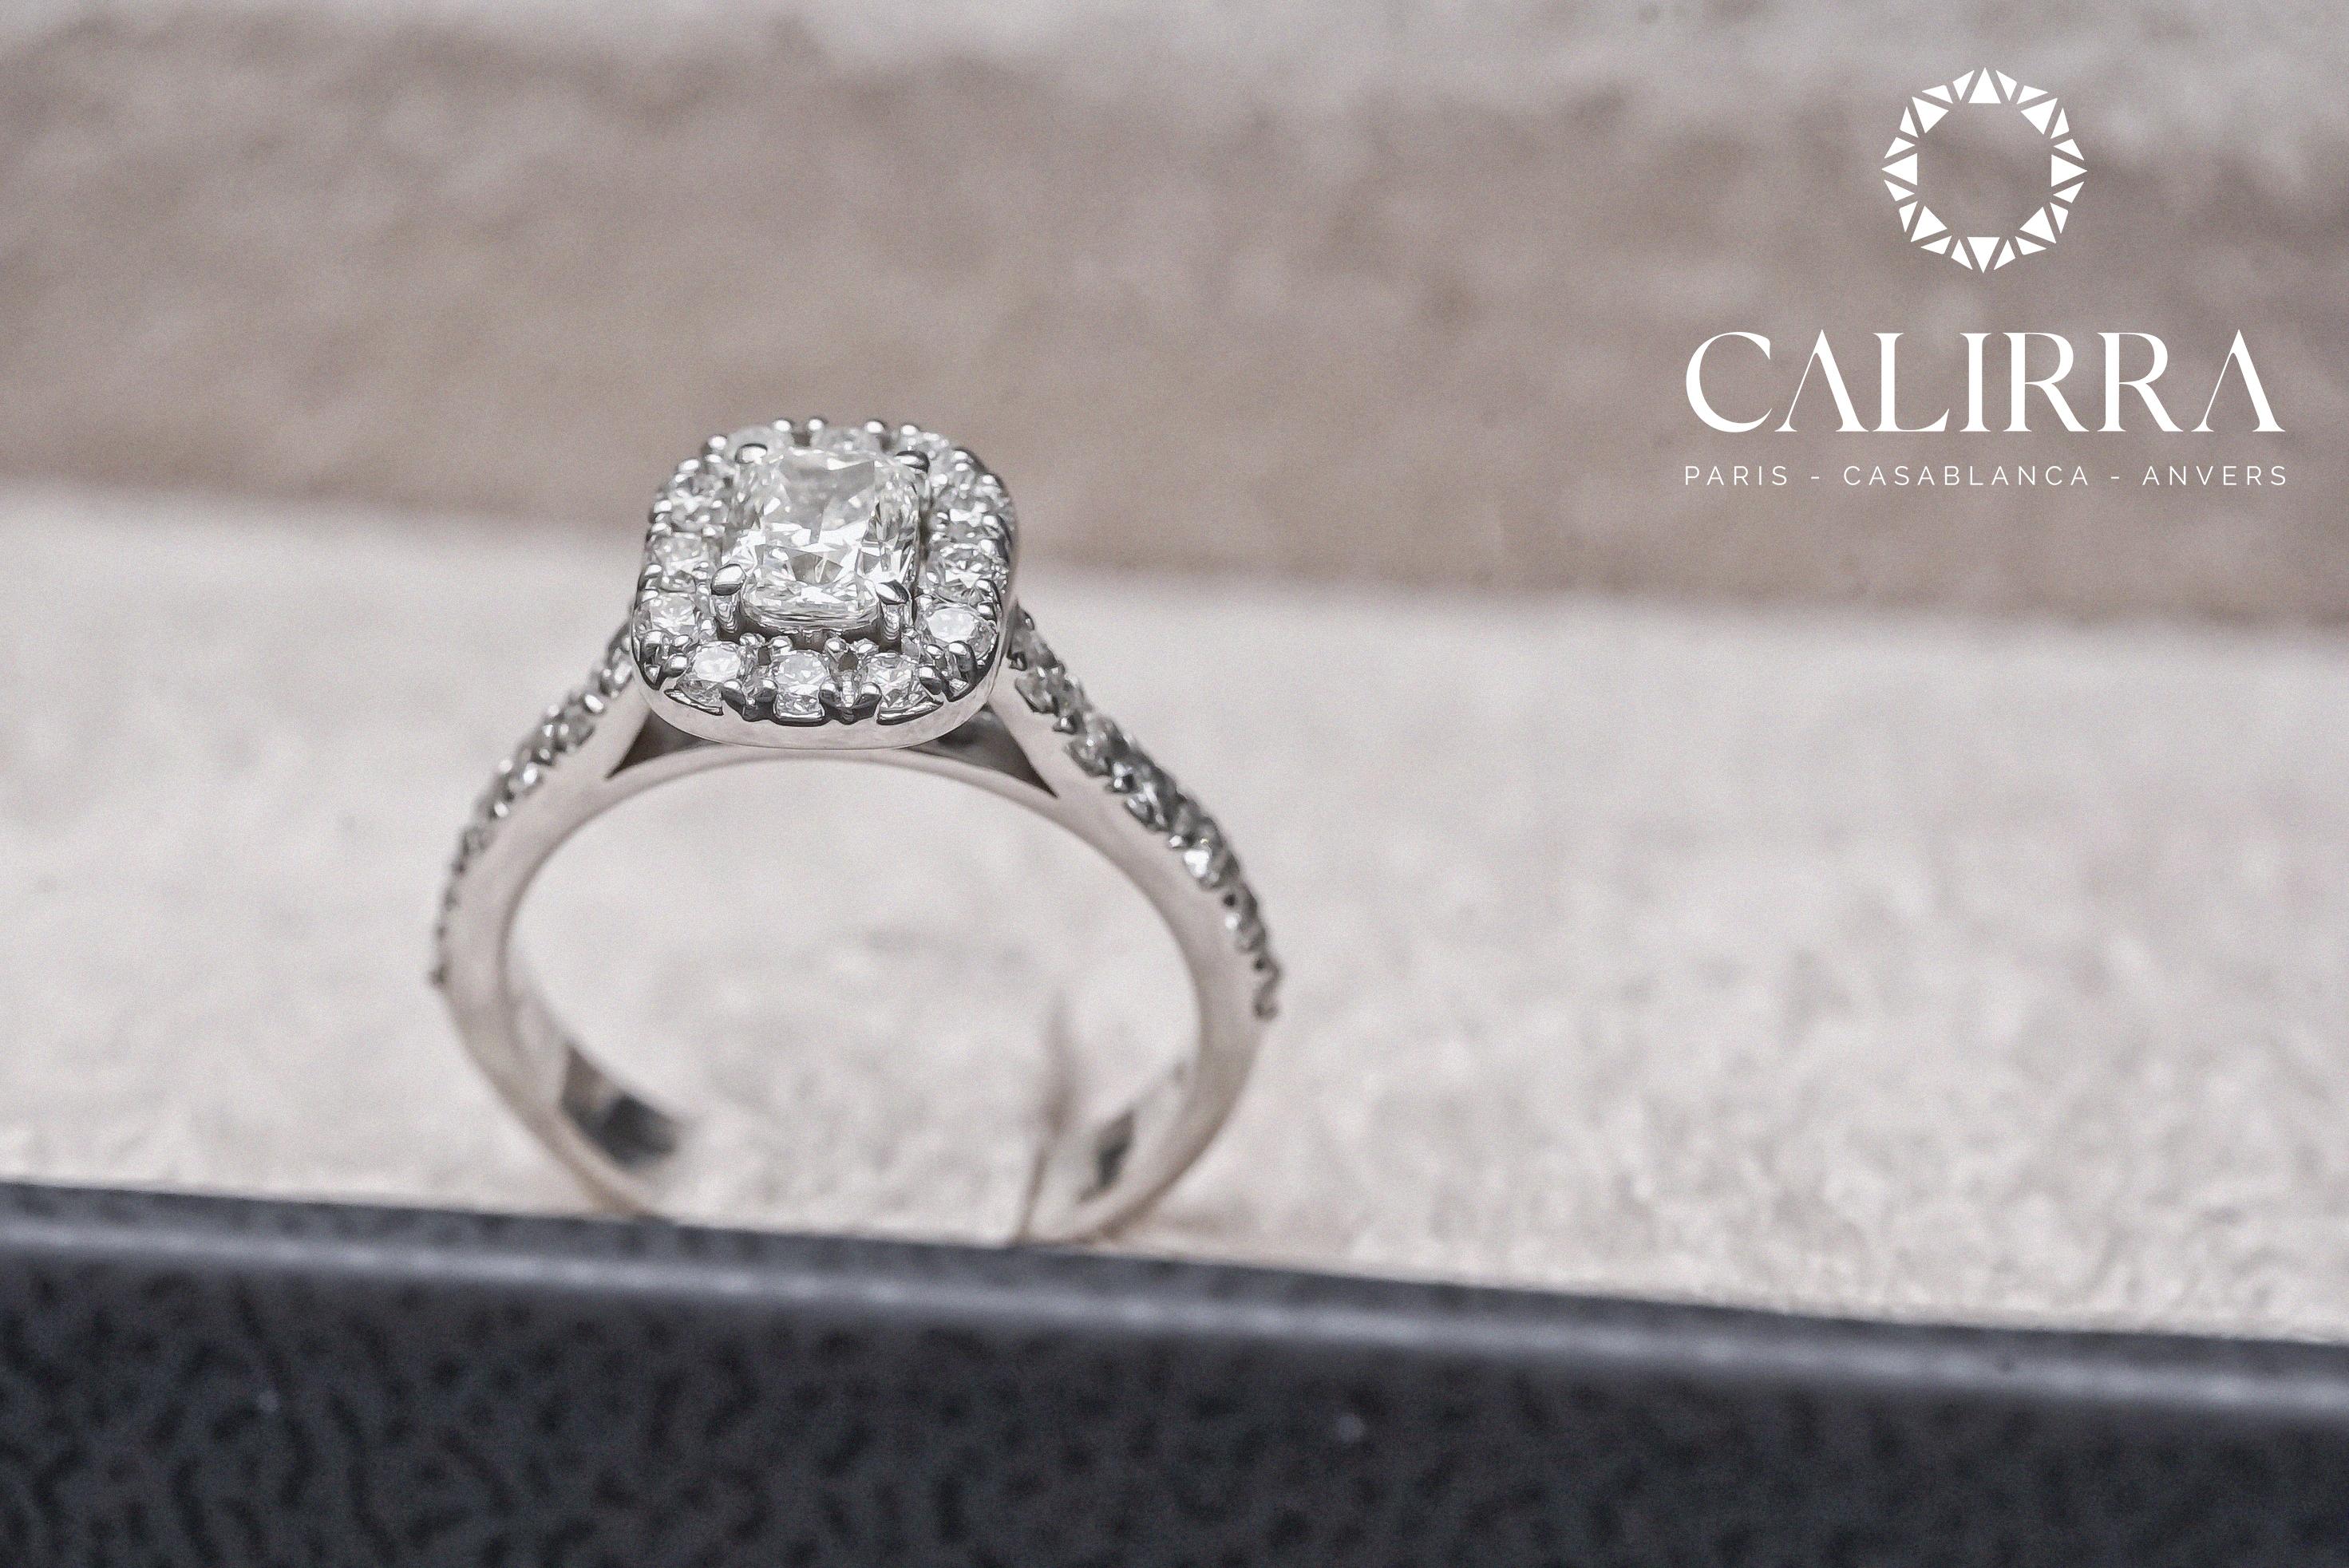 Calirra.com, ou le diamant avant-gardiste